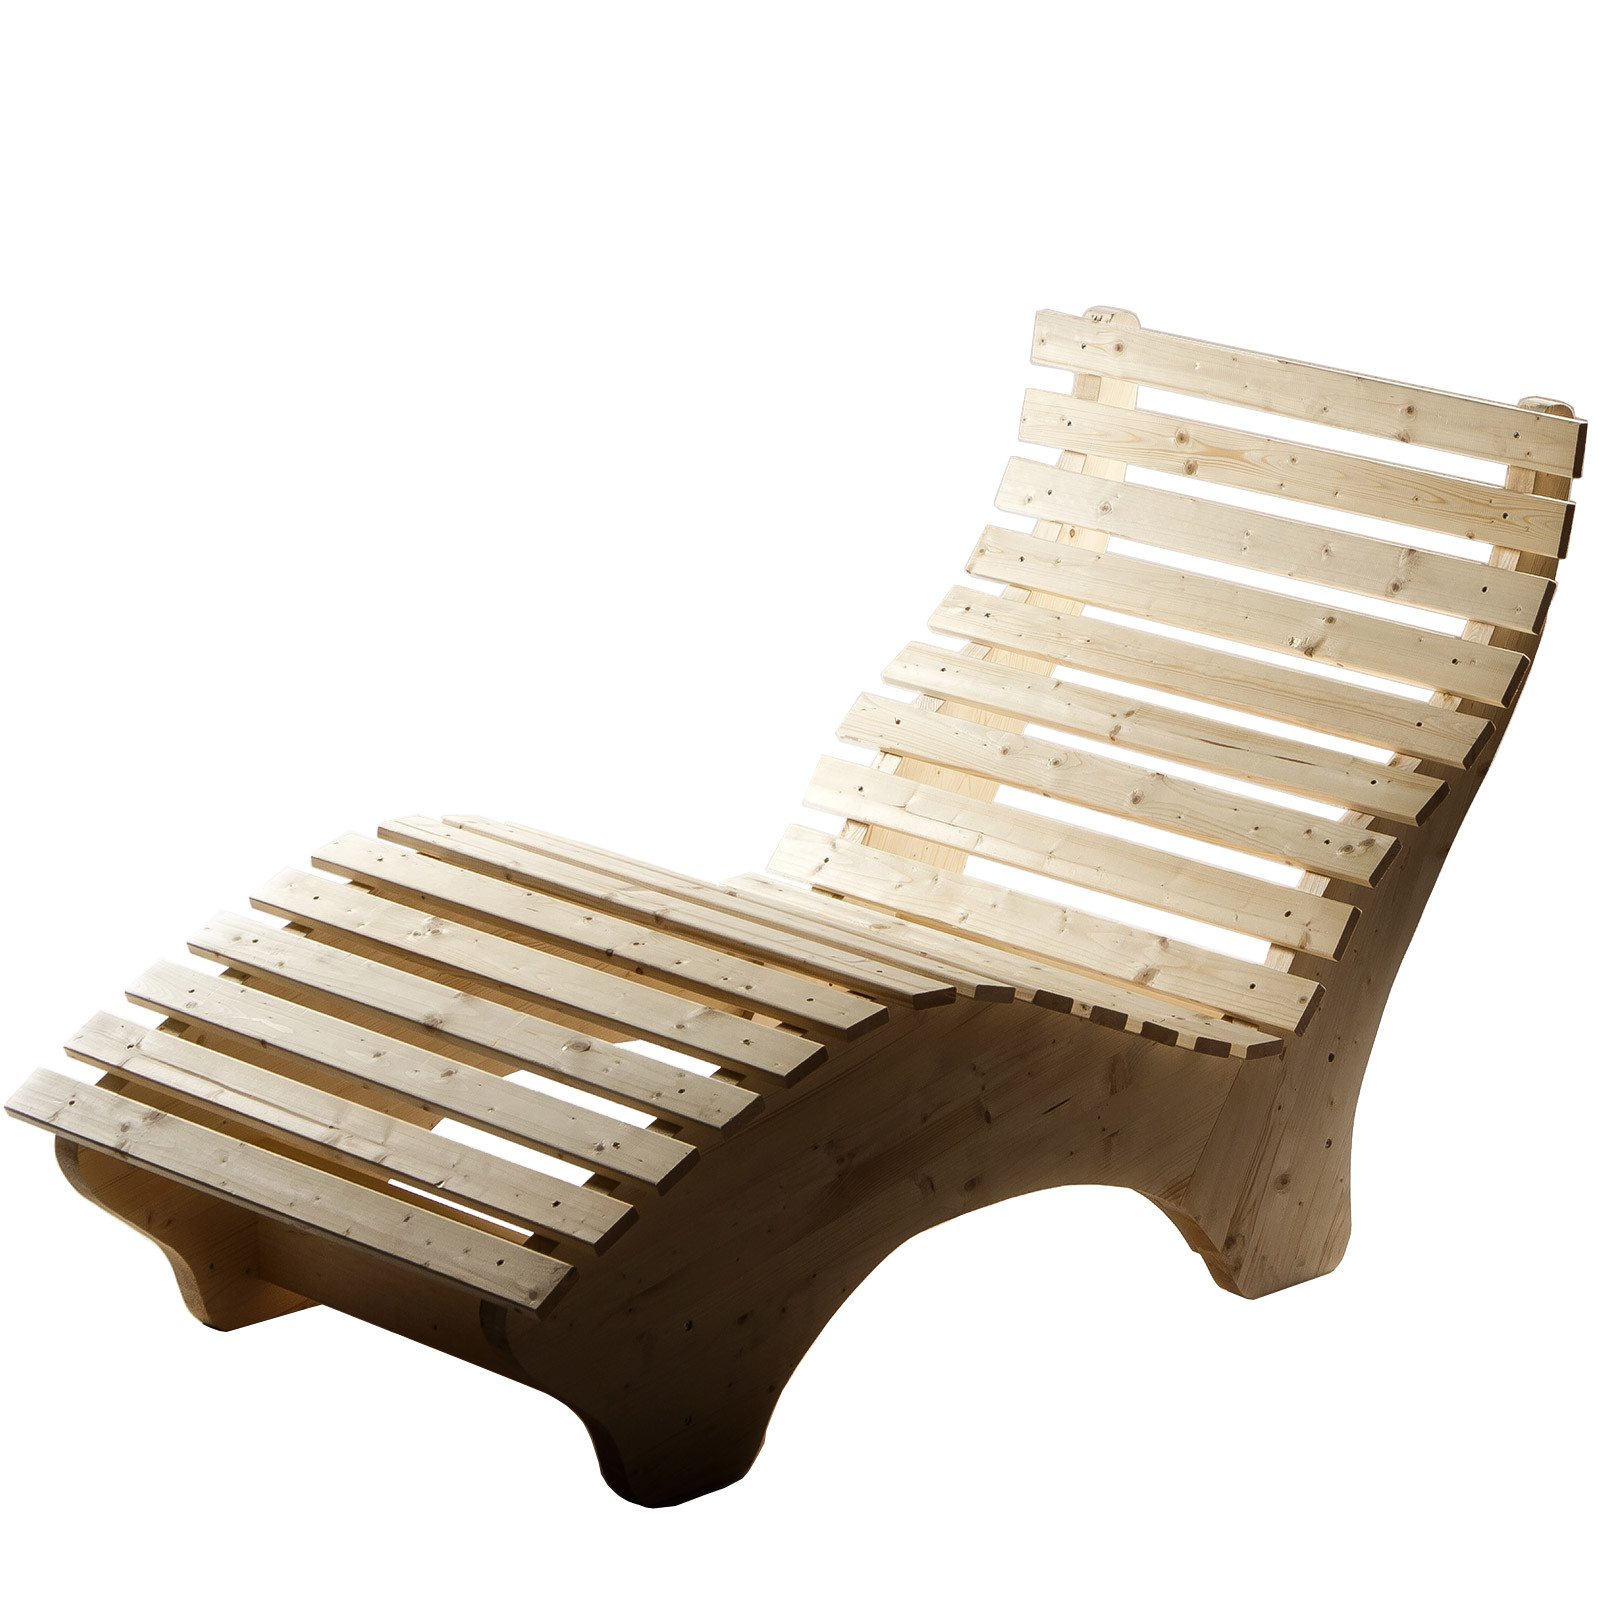 Relaxliege Ruhe-Vroni 2-teilig steh 58 cm